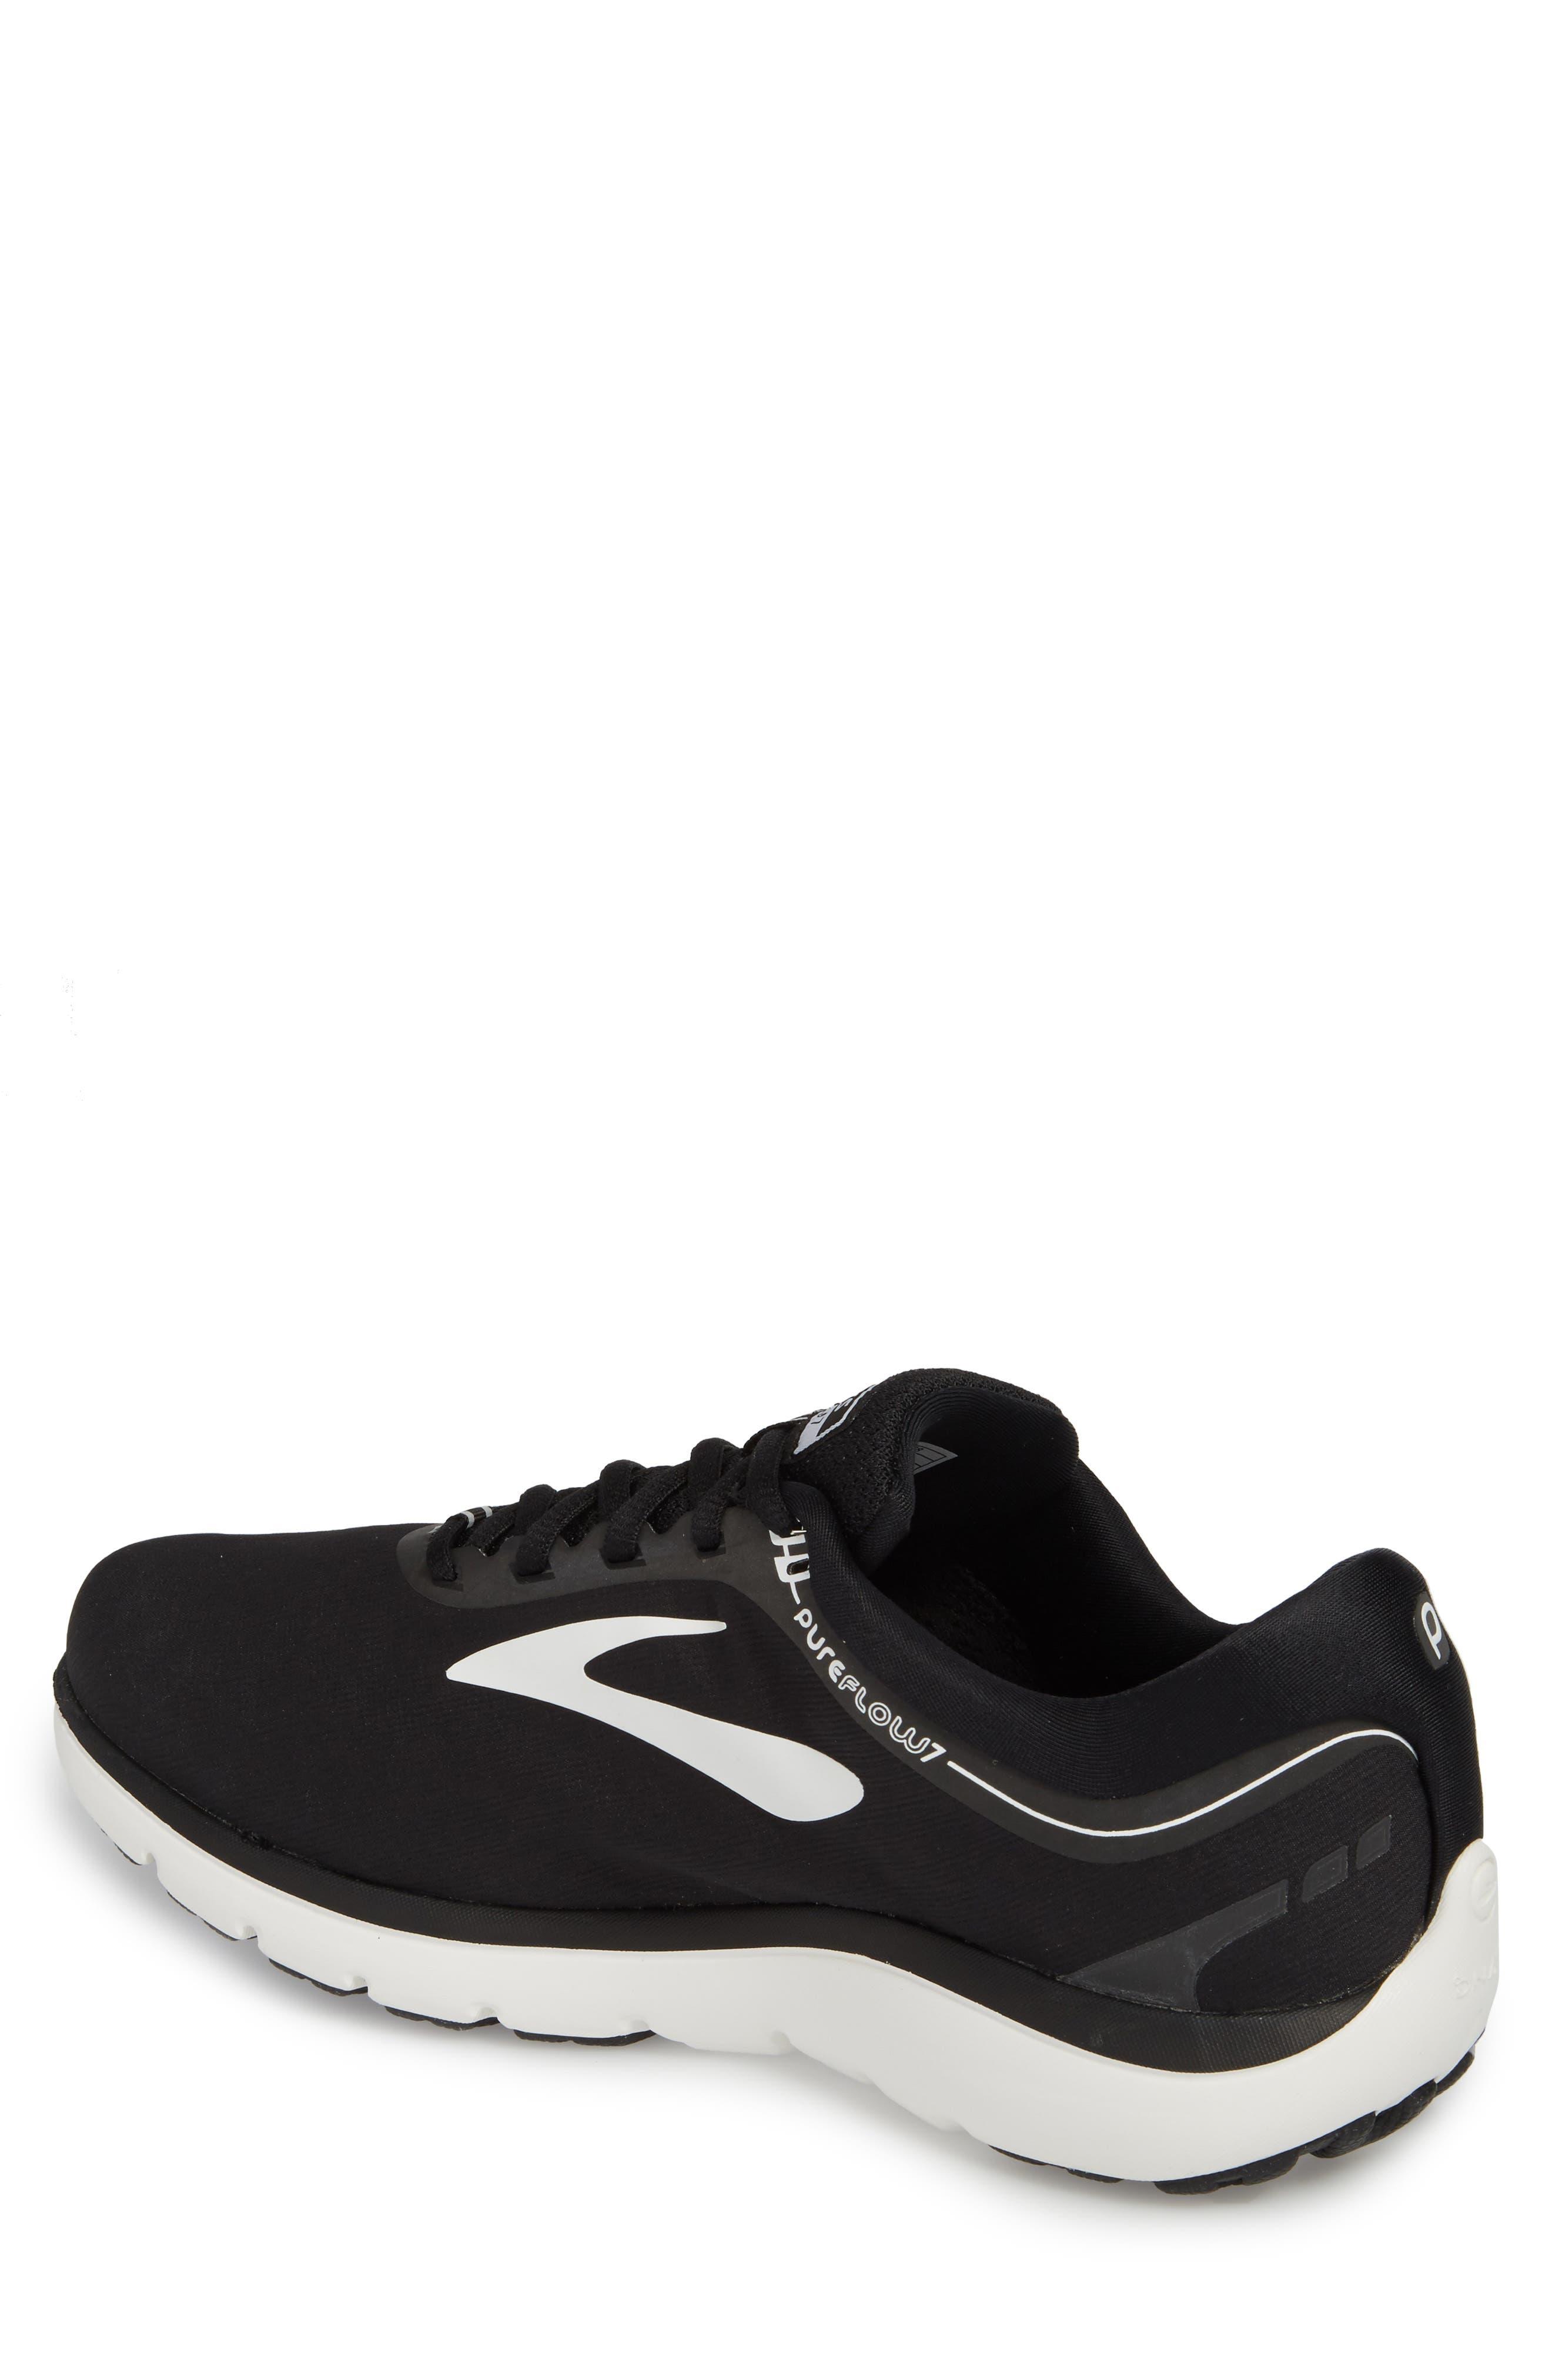 PureFlow 7 Running Shoe,                             Alternate thumbnail 2, color,                             Black/ White